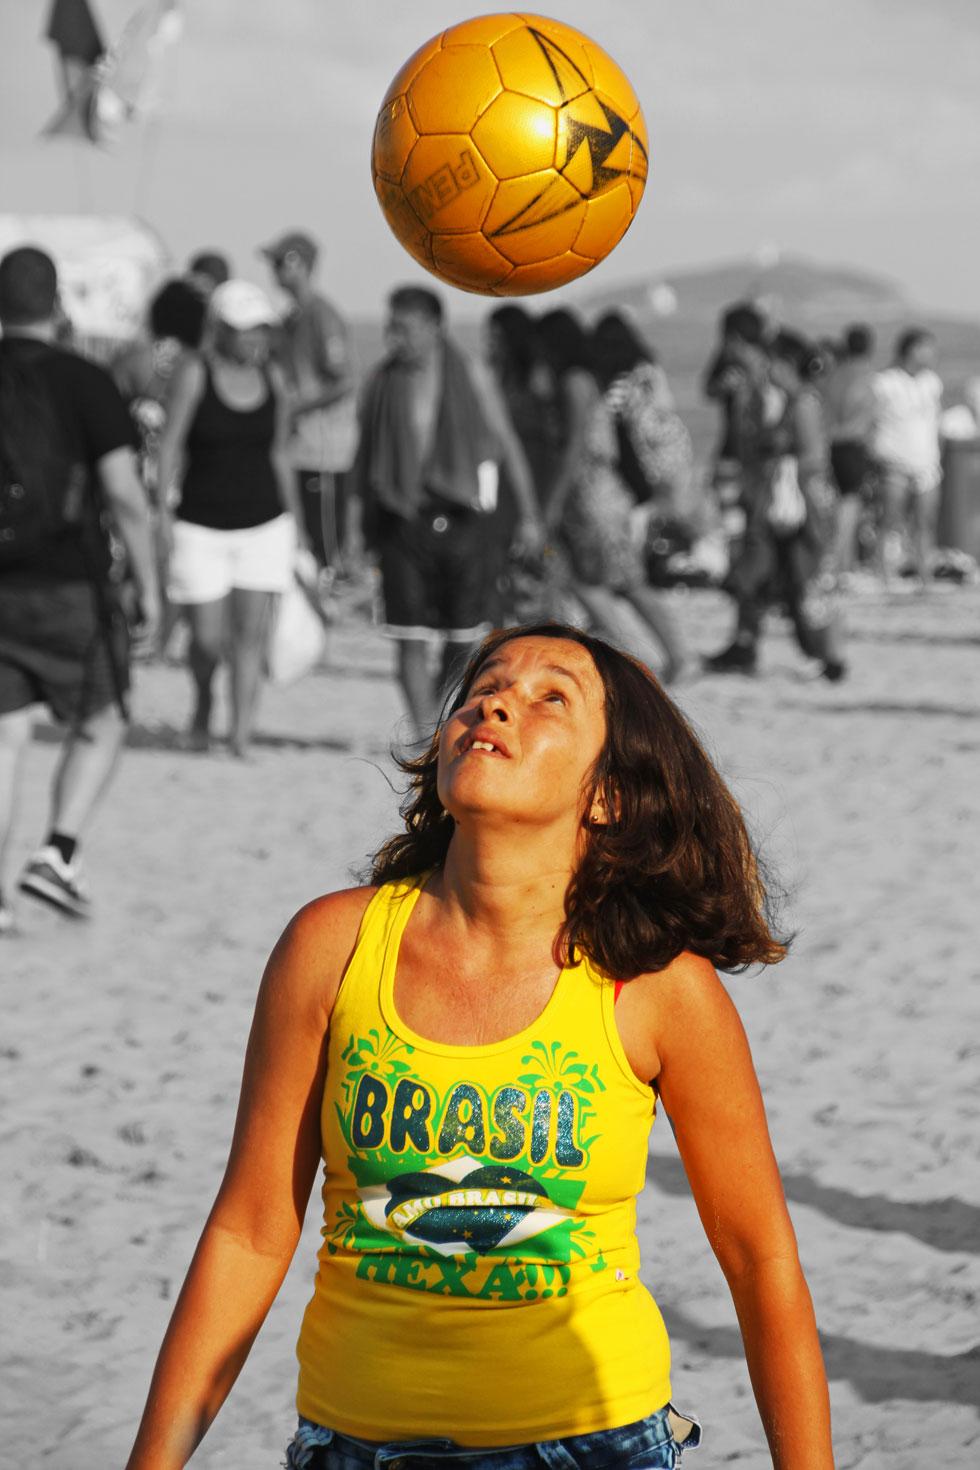 femaile-ball-juggler-copaca